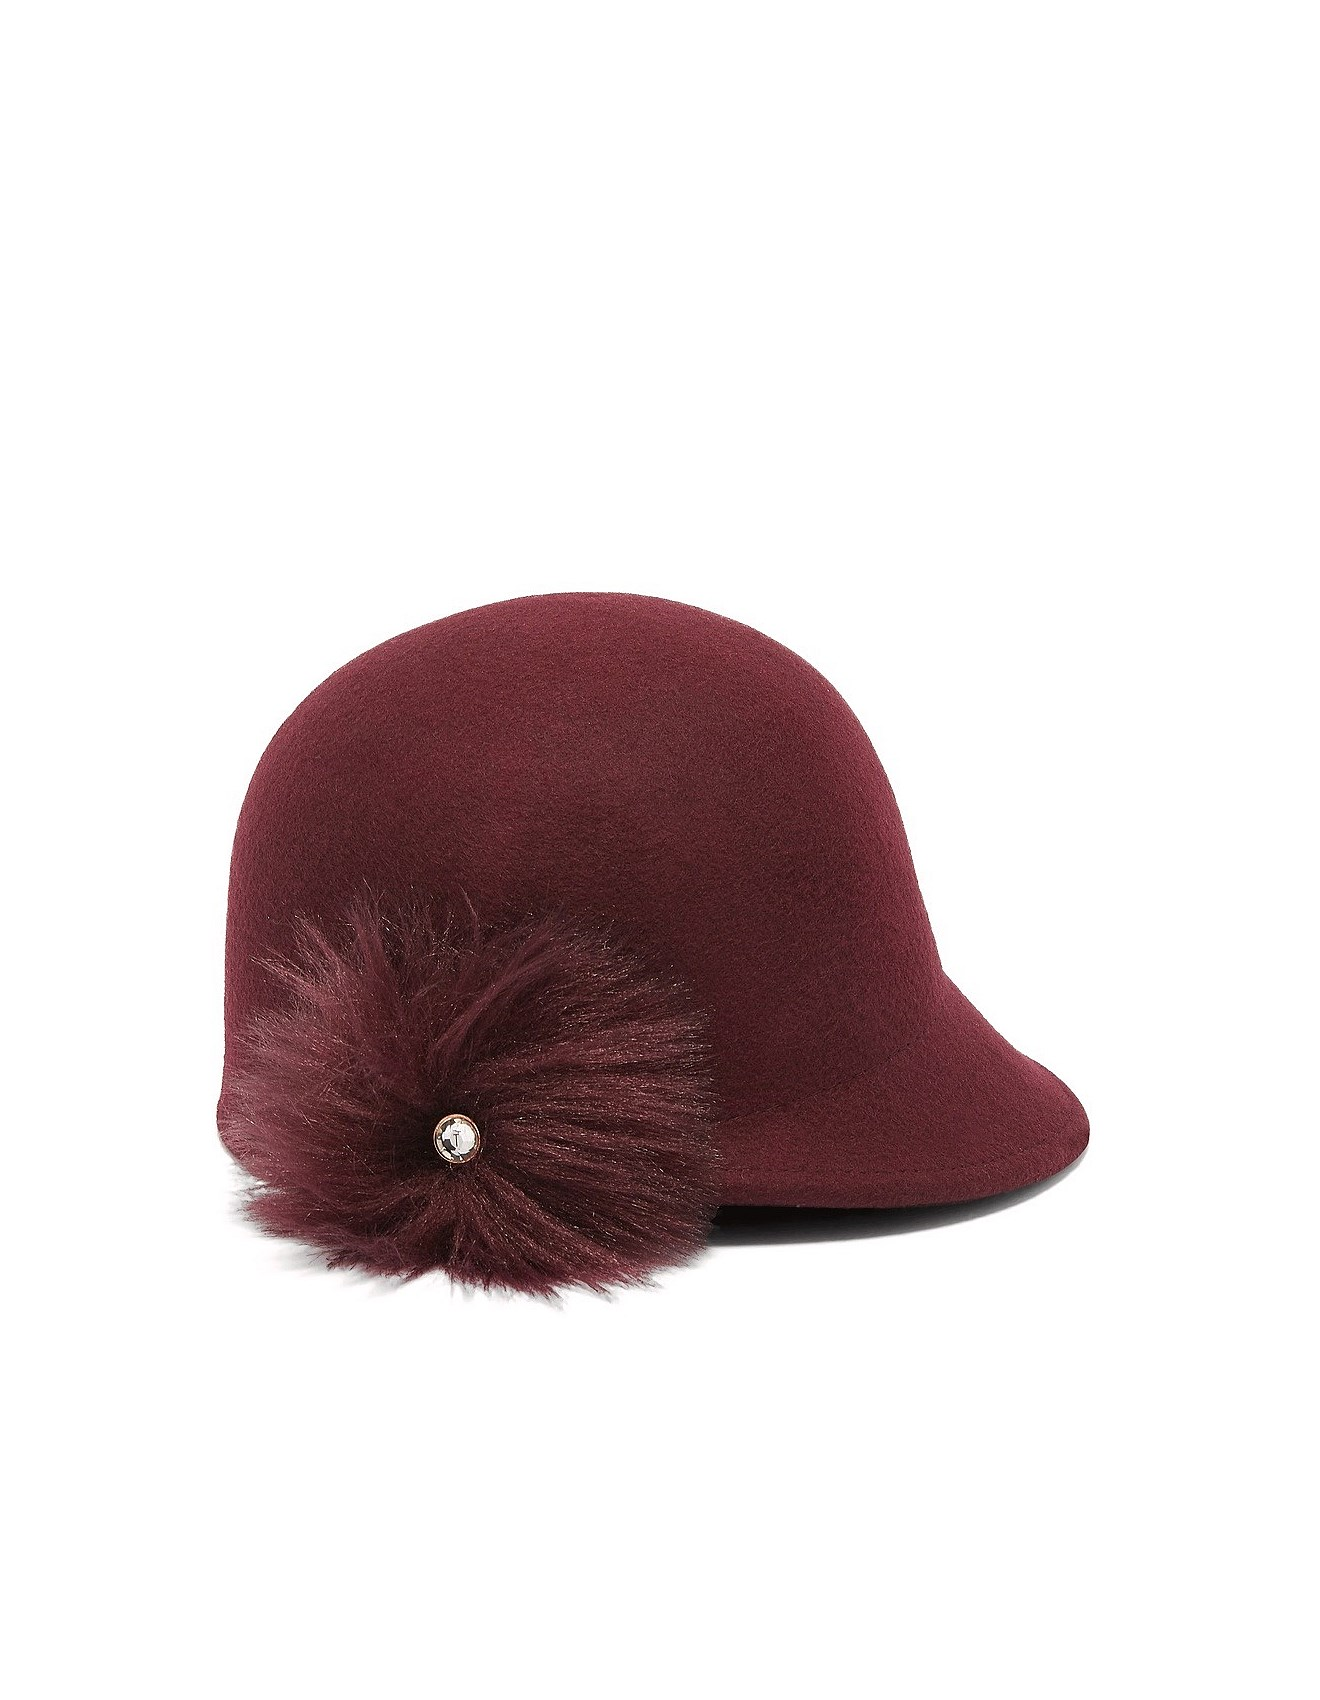 84434eef0cd FAUX FUR POM POM FELT HAT